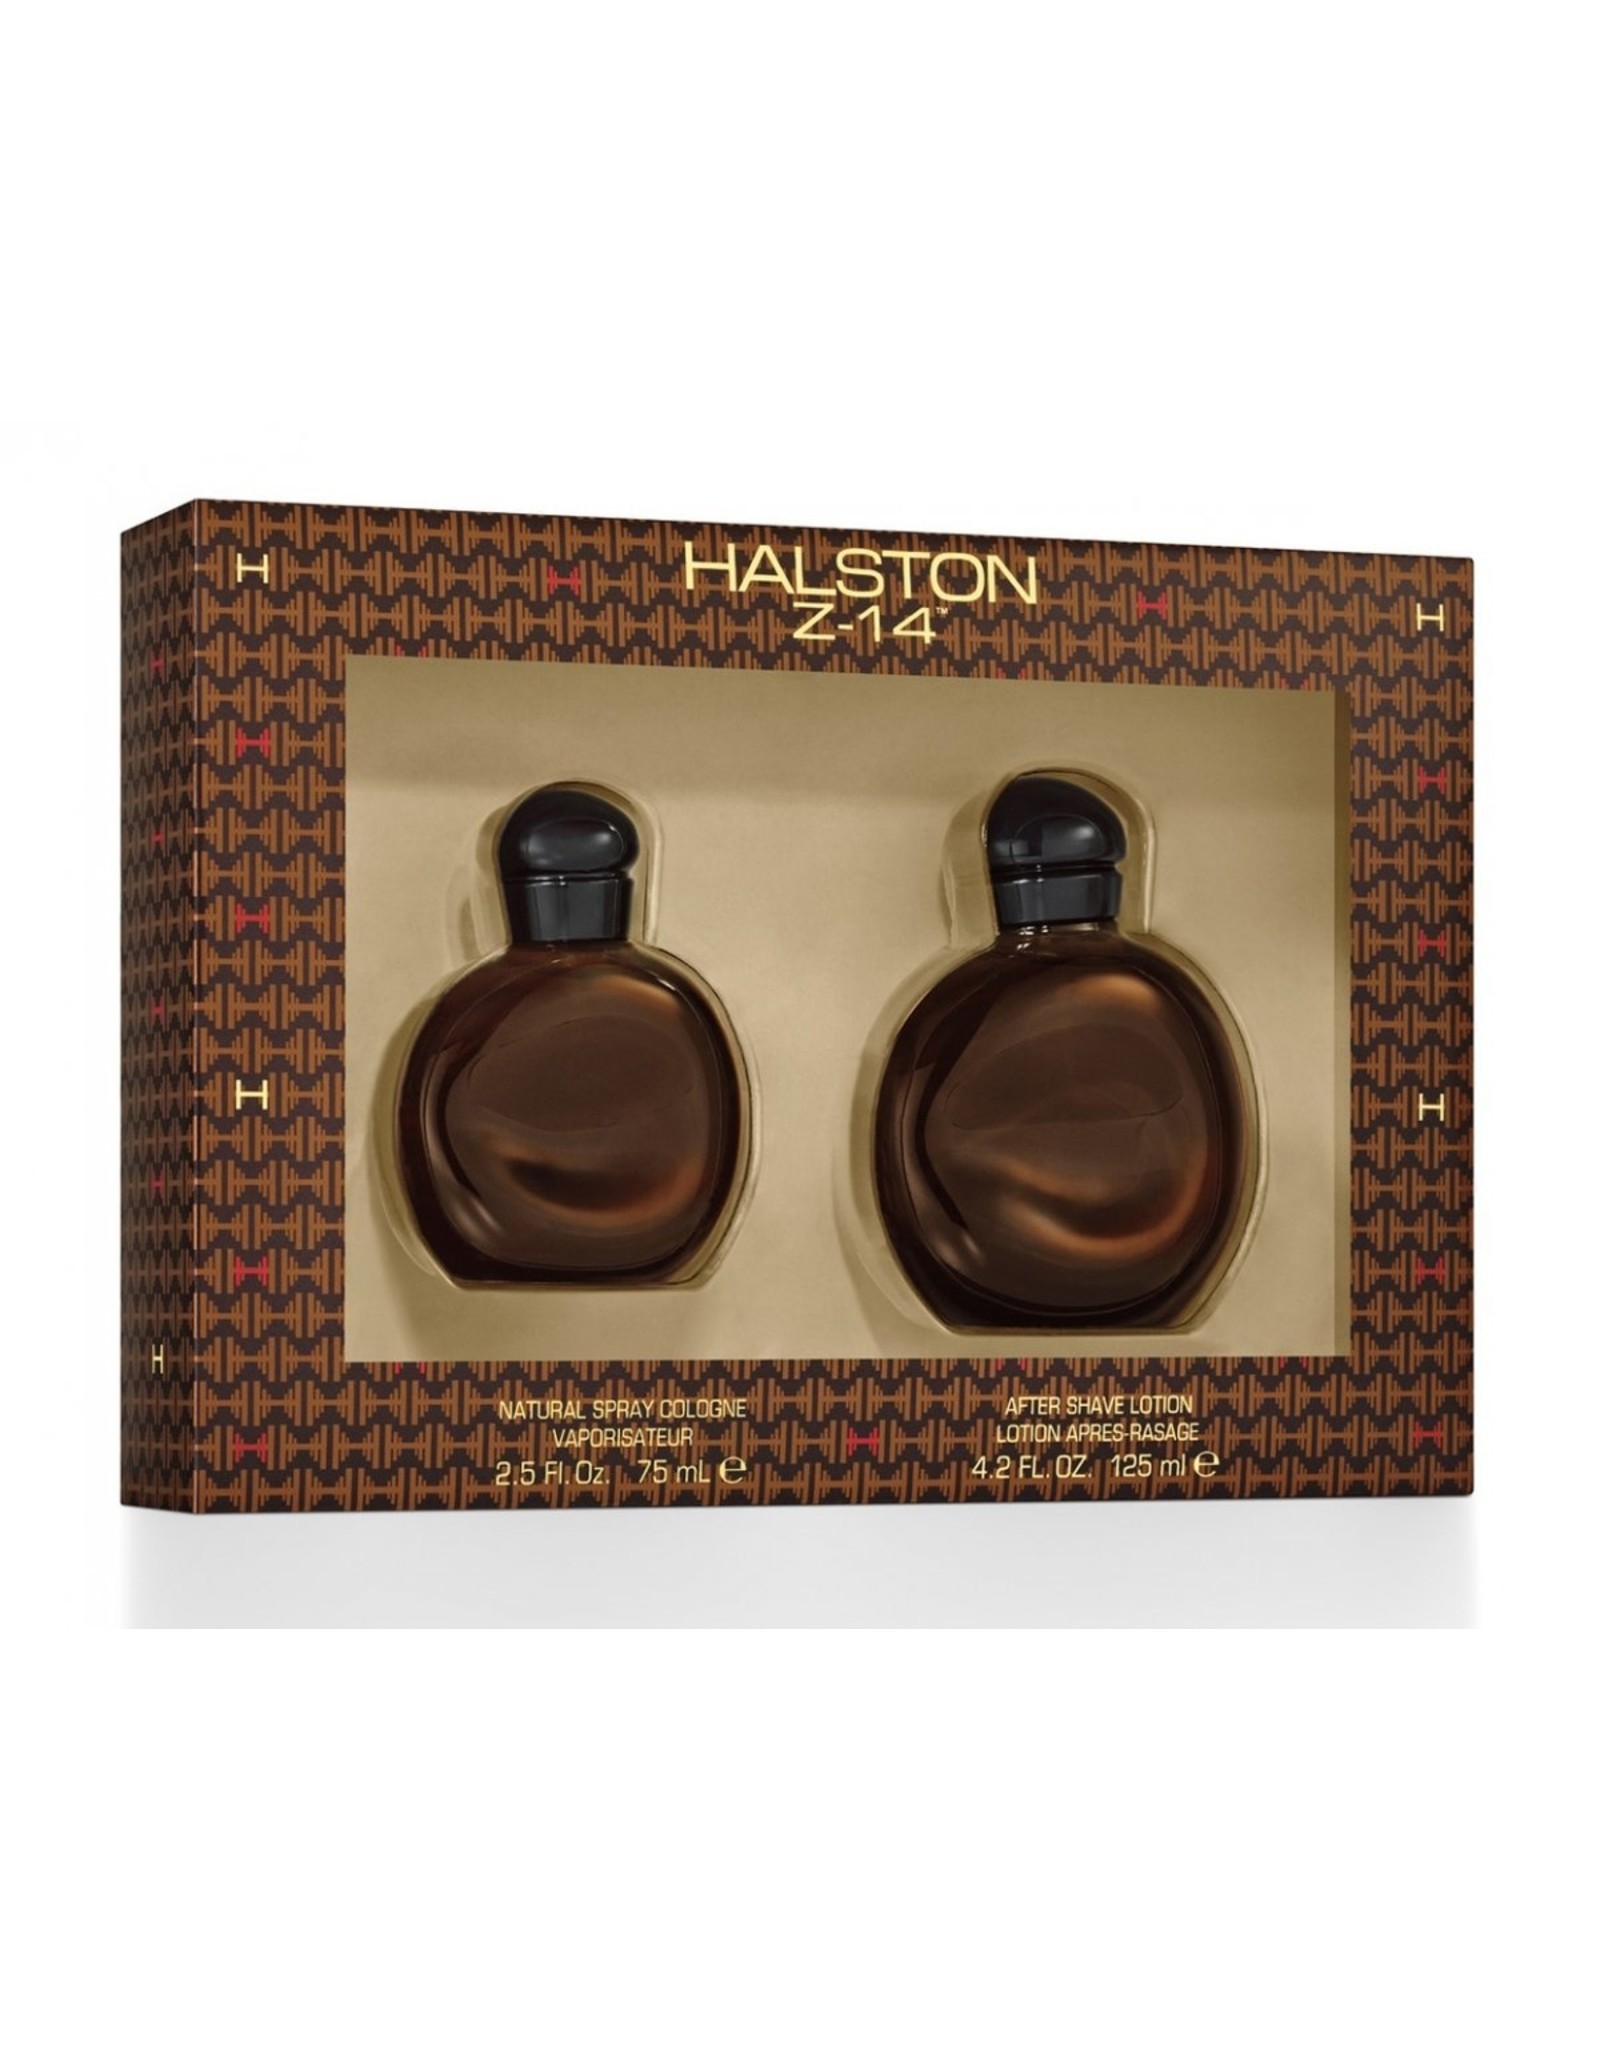 HALSTON HALSTON Z-14